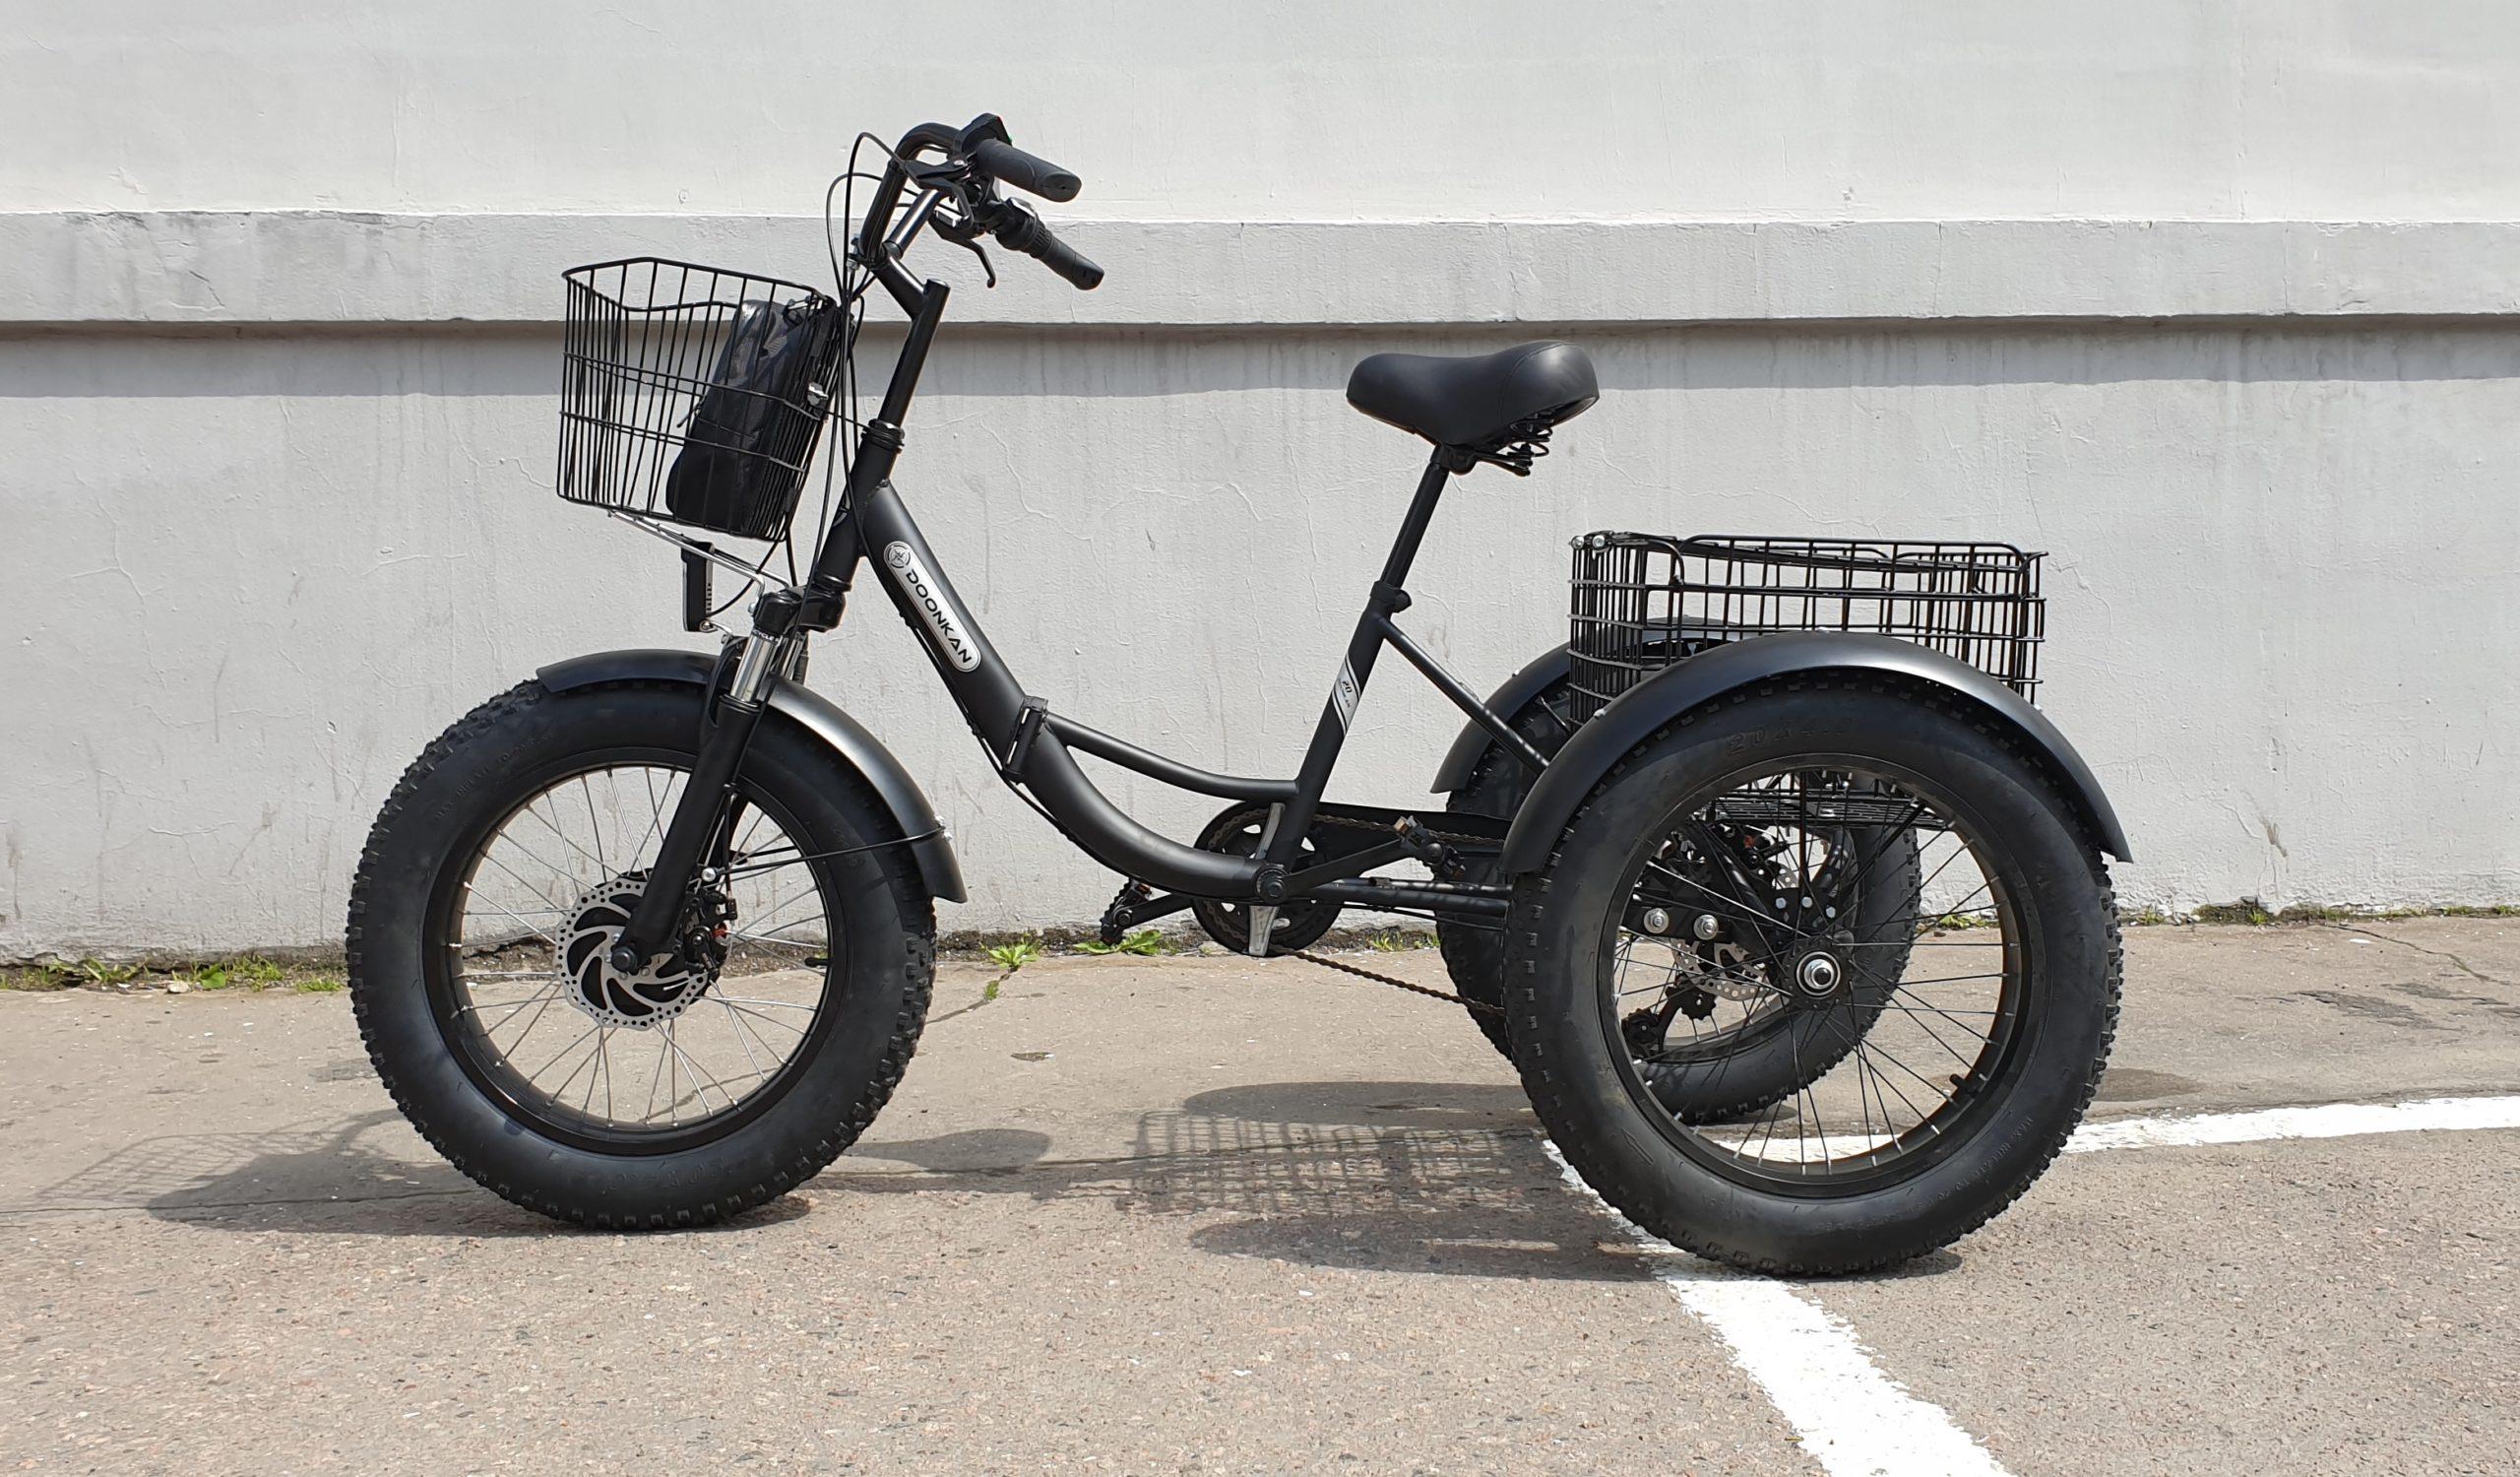 Doonkan Trike Трицикл трайк трехколесный велосипед Фэтбайк Панда Panda